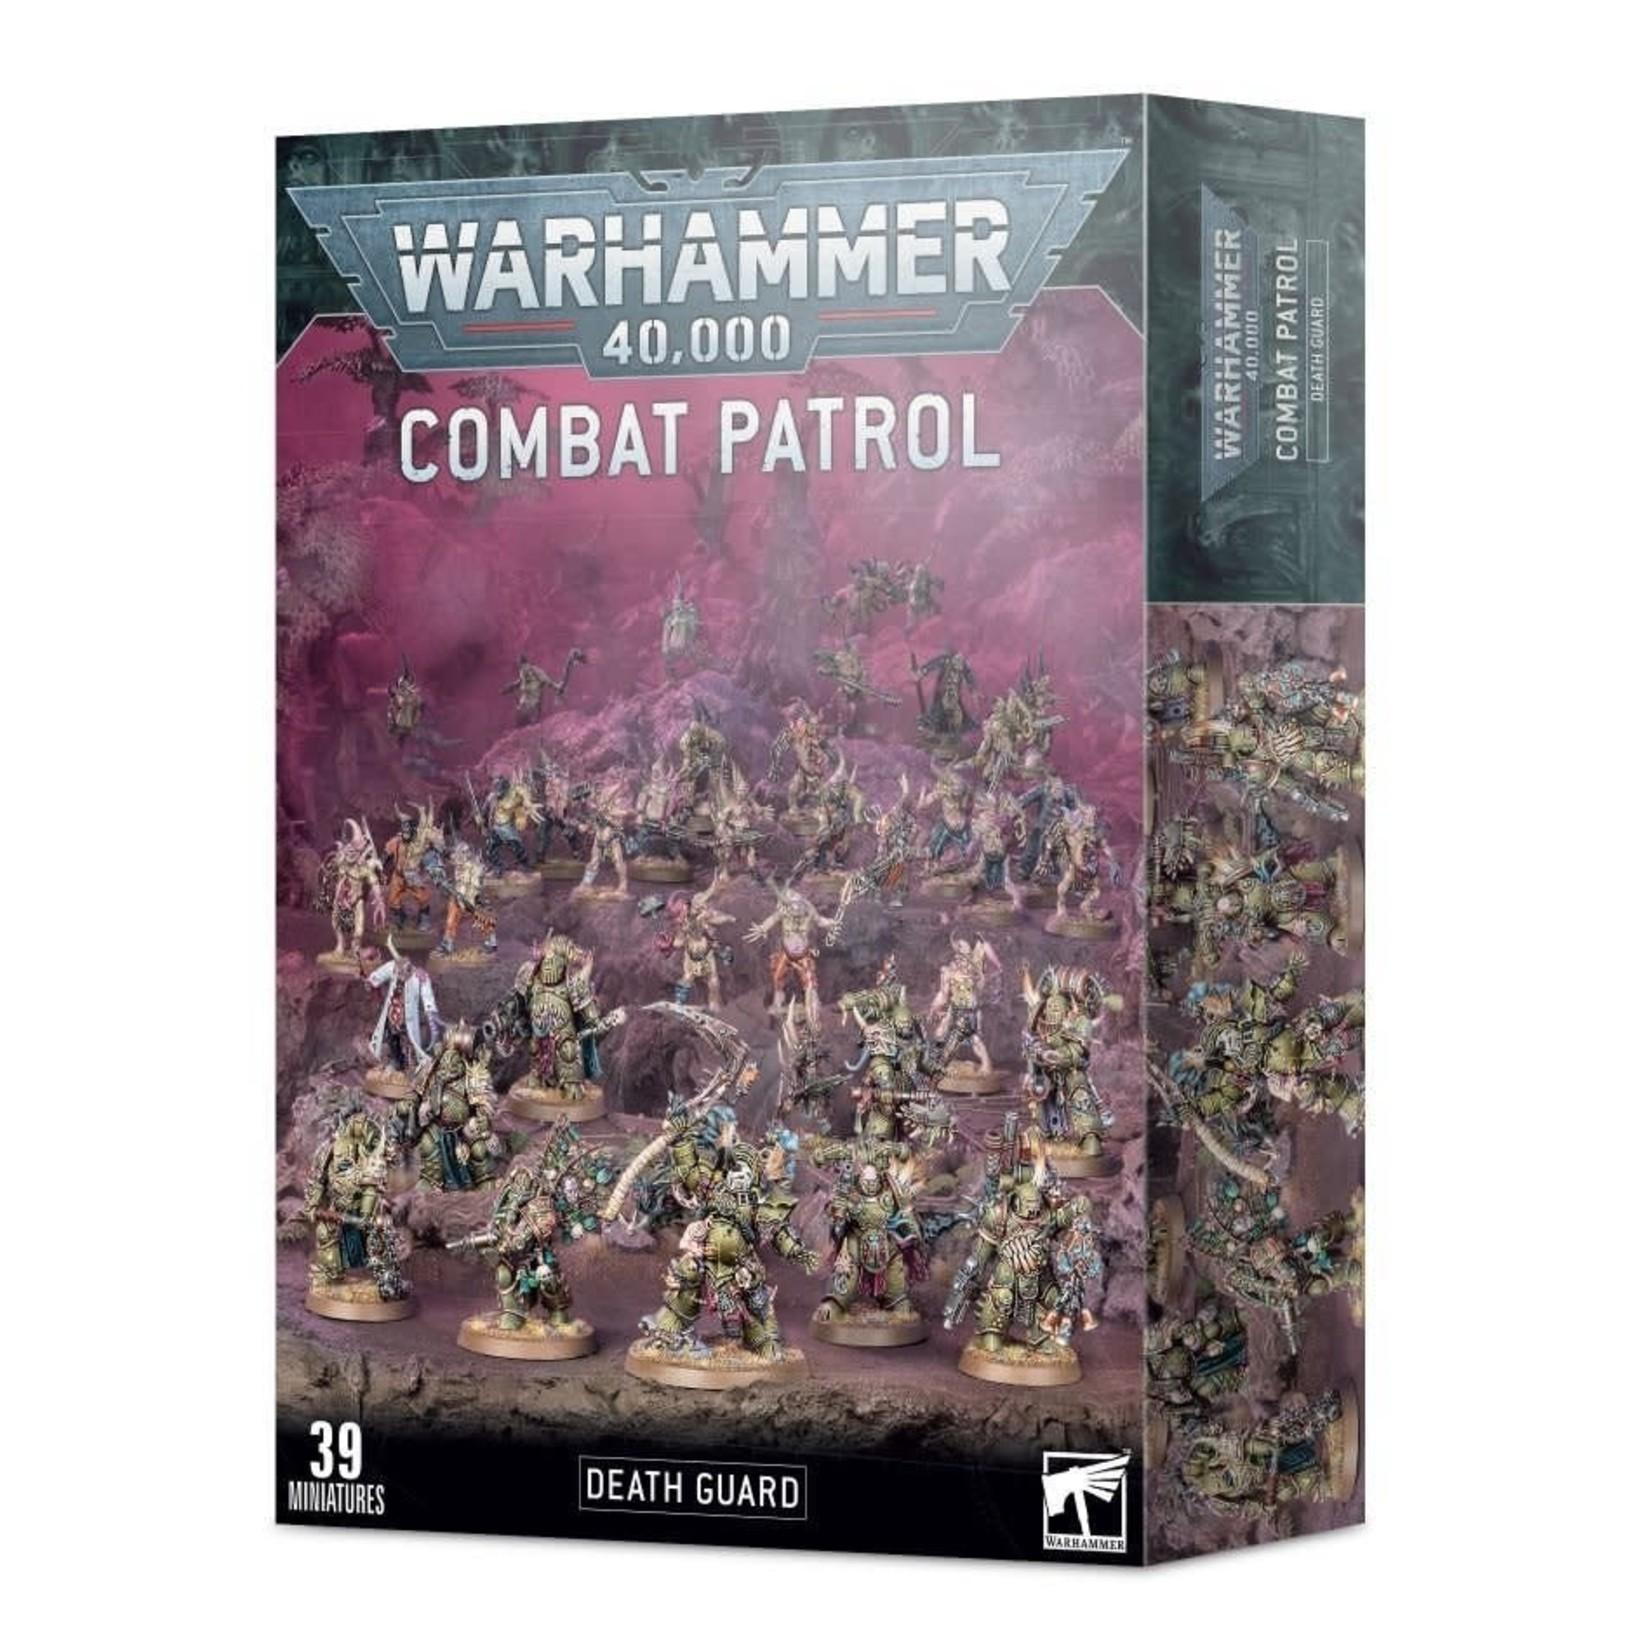 Games Workshop Warhammer 40k: Combat Patrol - Death Guard